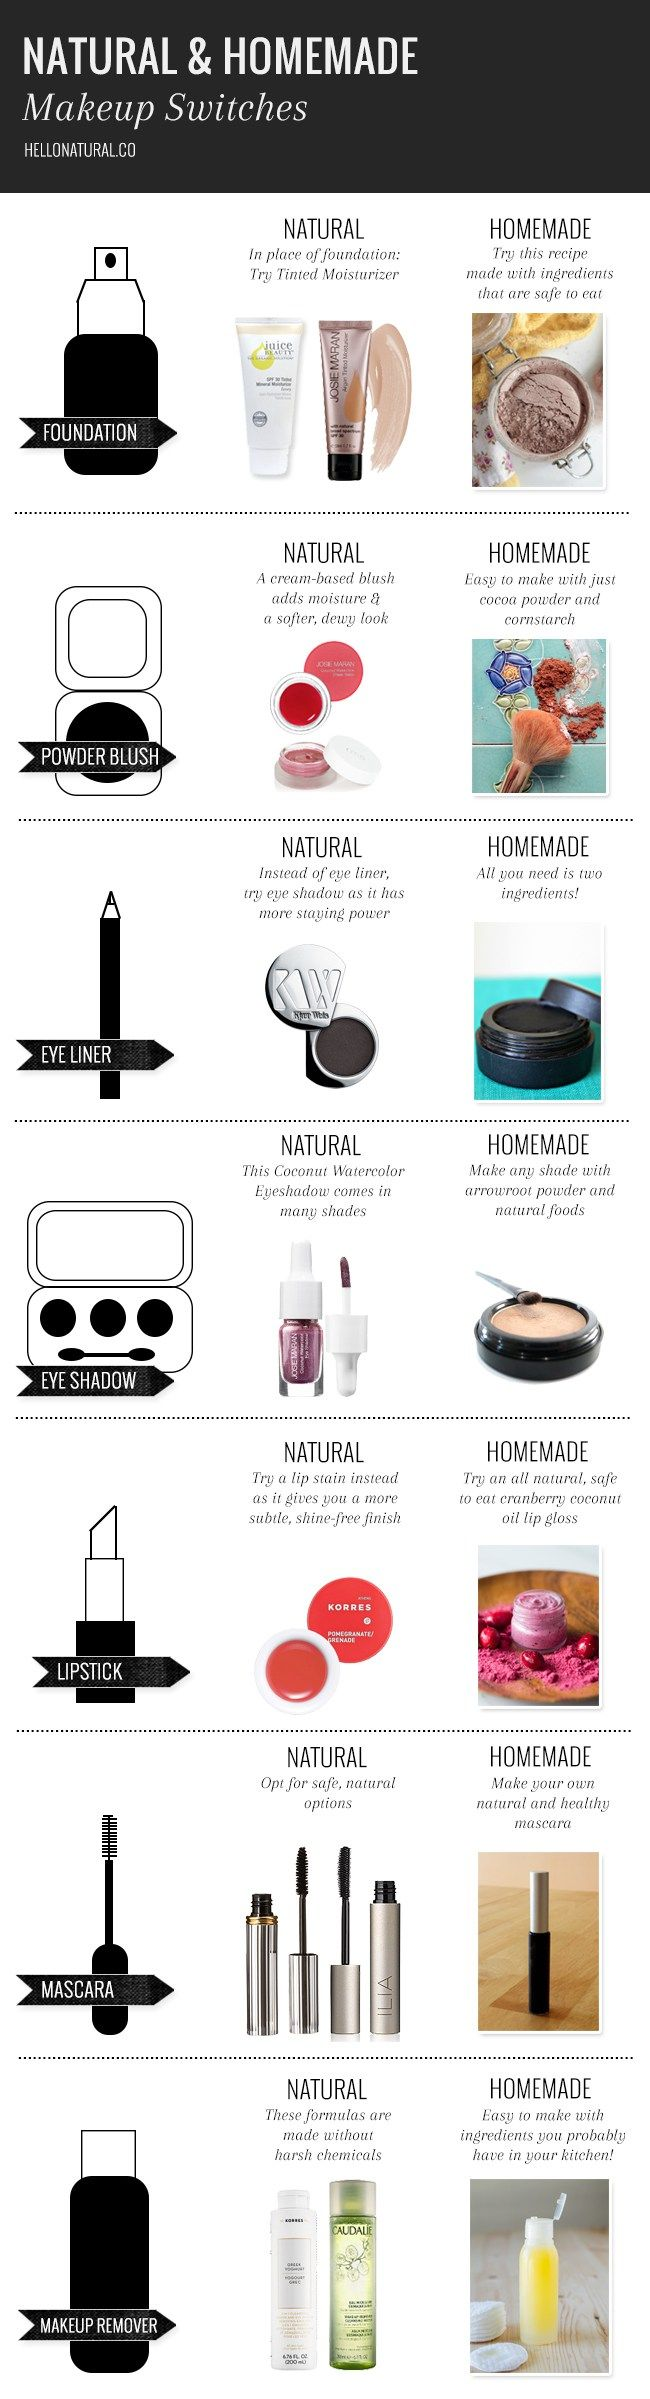 7 Natural and Homemade Makeup Alternatives